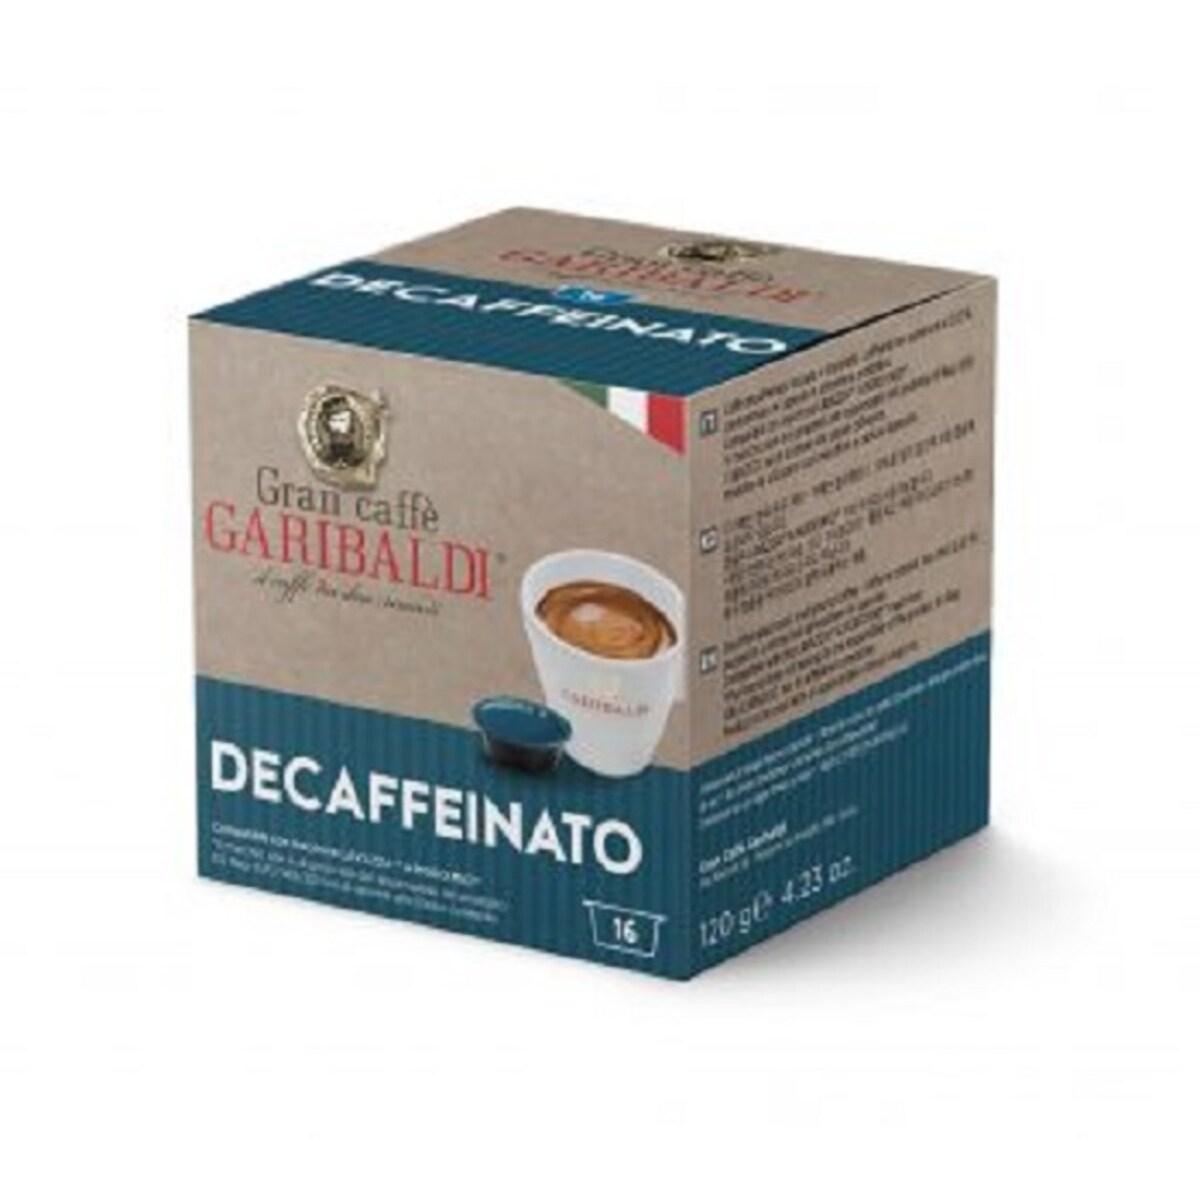 Garibaldi Decaffeinato, Lavazza A Modo Mio съвместими капсули